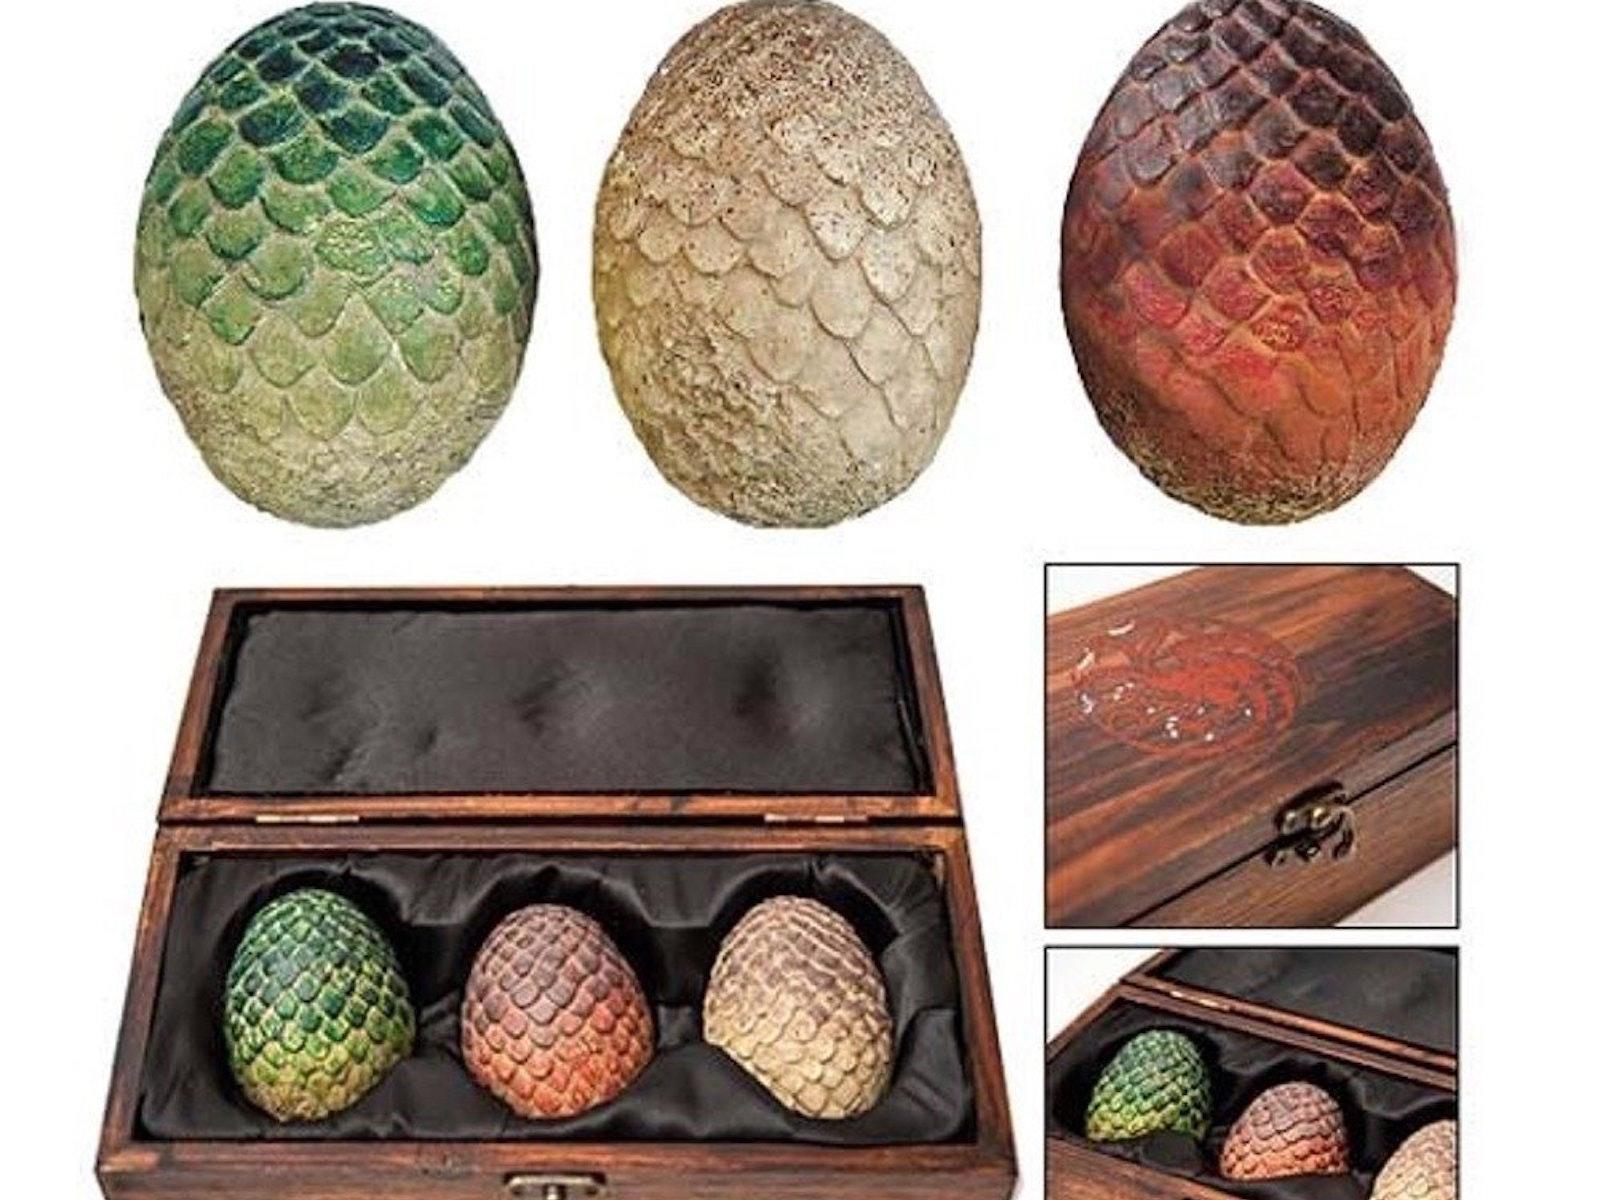 This trio of collectible dragon eggs